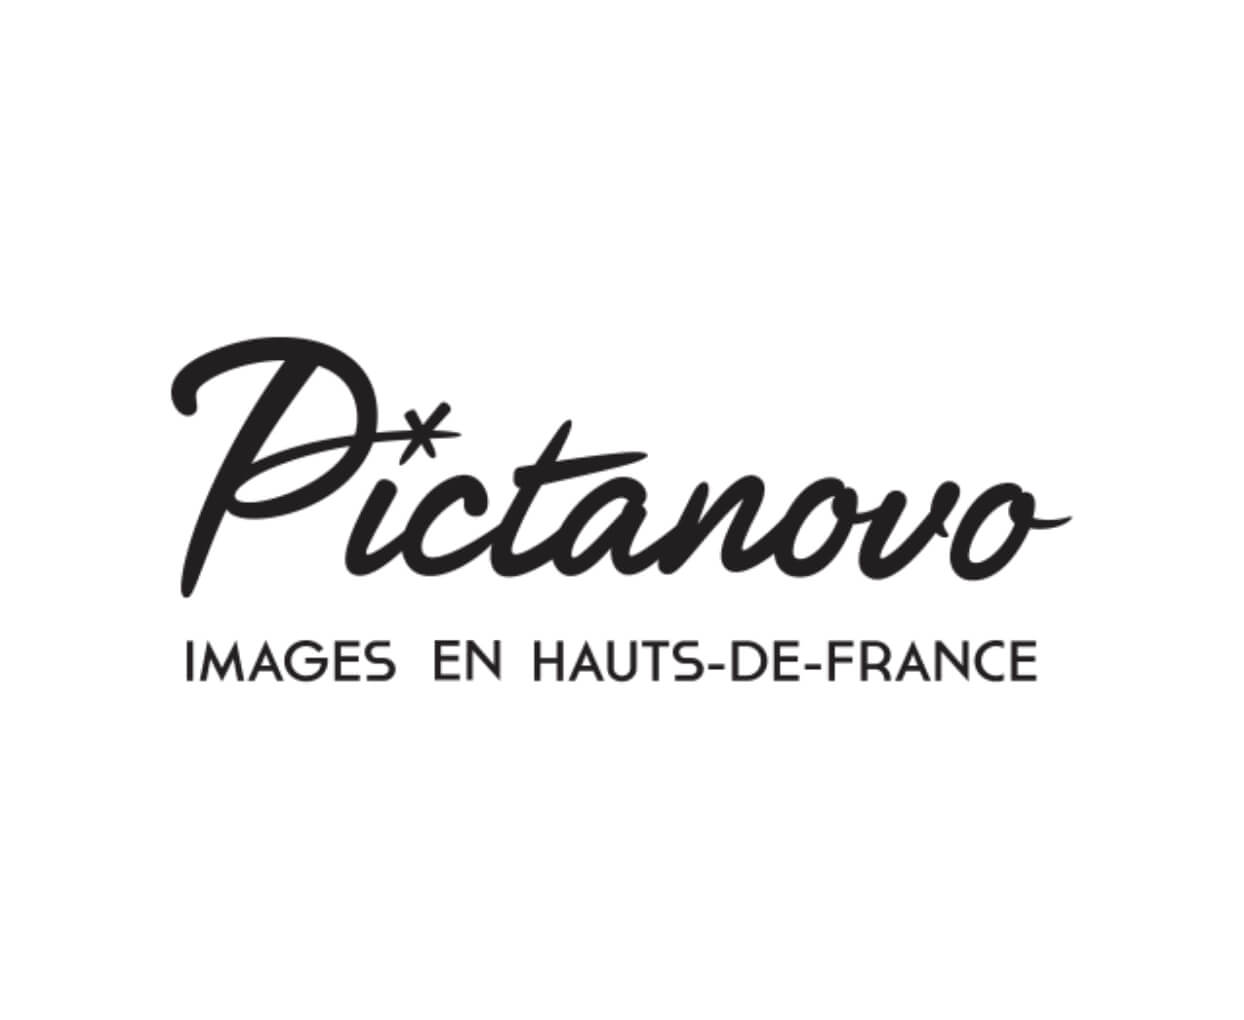 Logo pictanovo